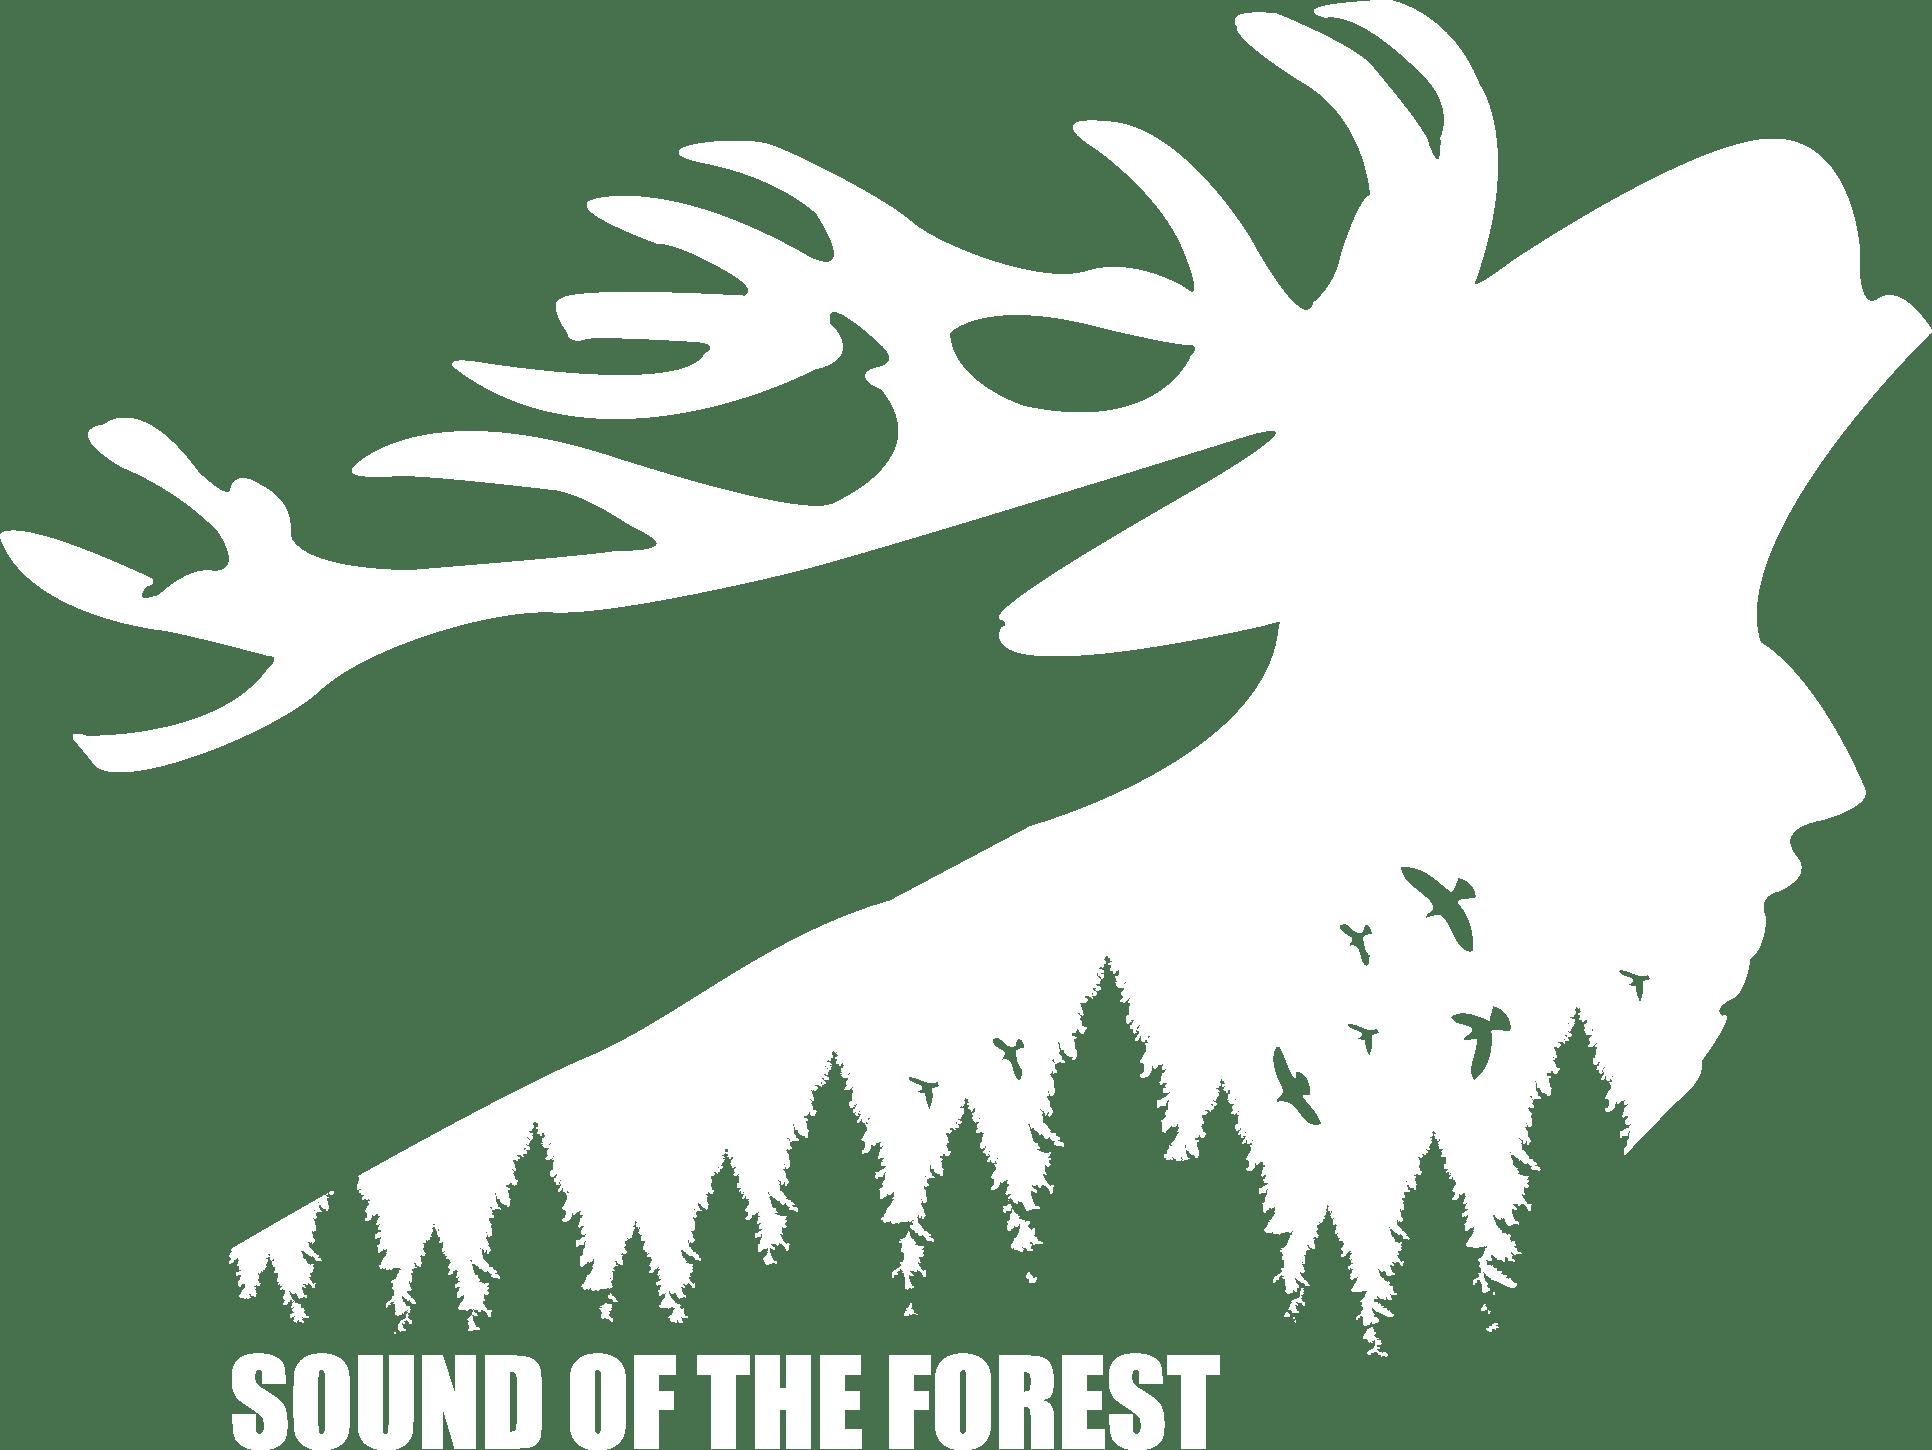 sotf_logo_hirschundbaeume-1_white